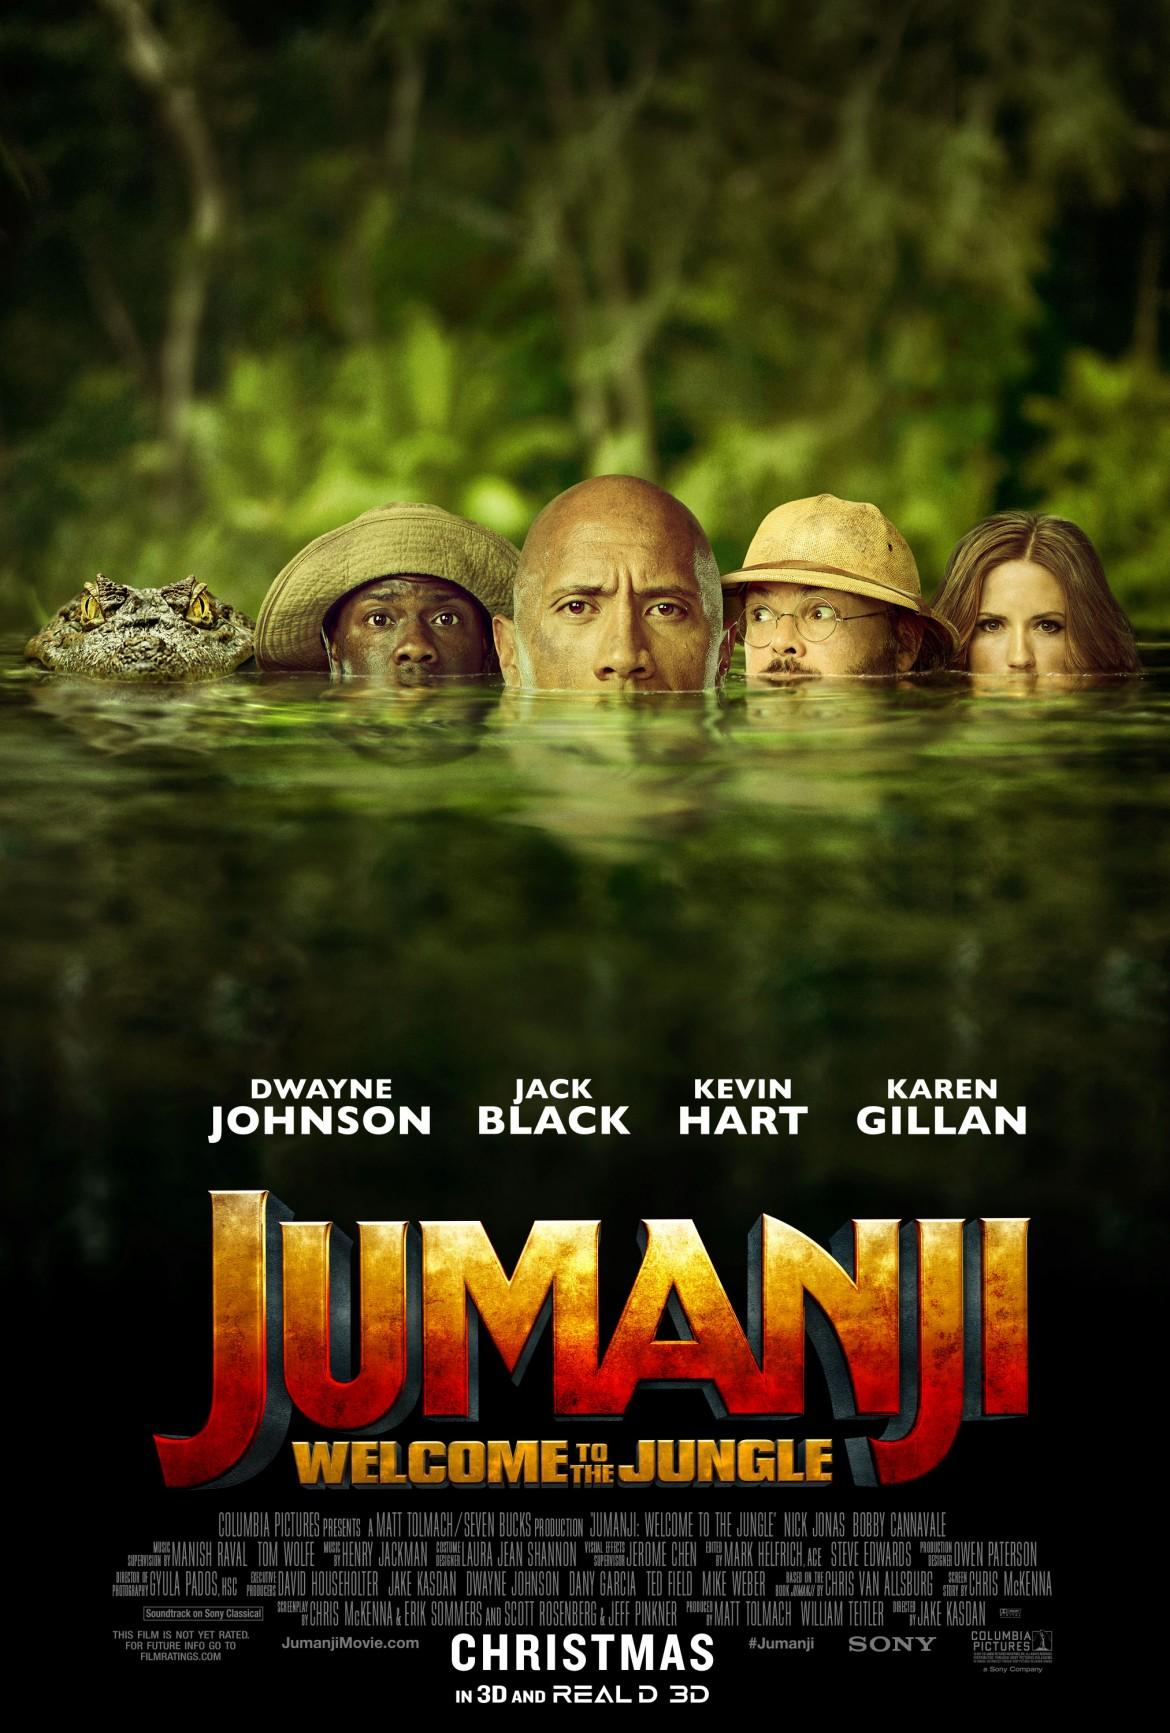 jumanji-dom-JMNJ_ONLINE_1SHT_FNL_3DRD3D_01_rgb